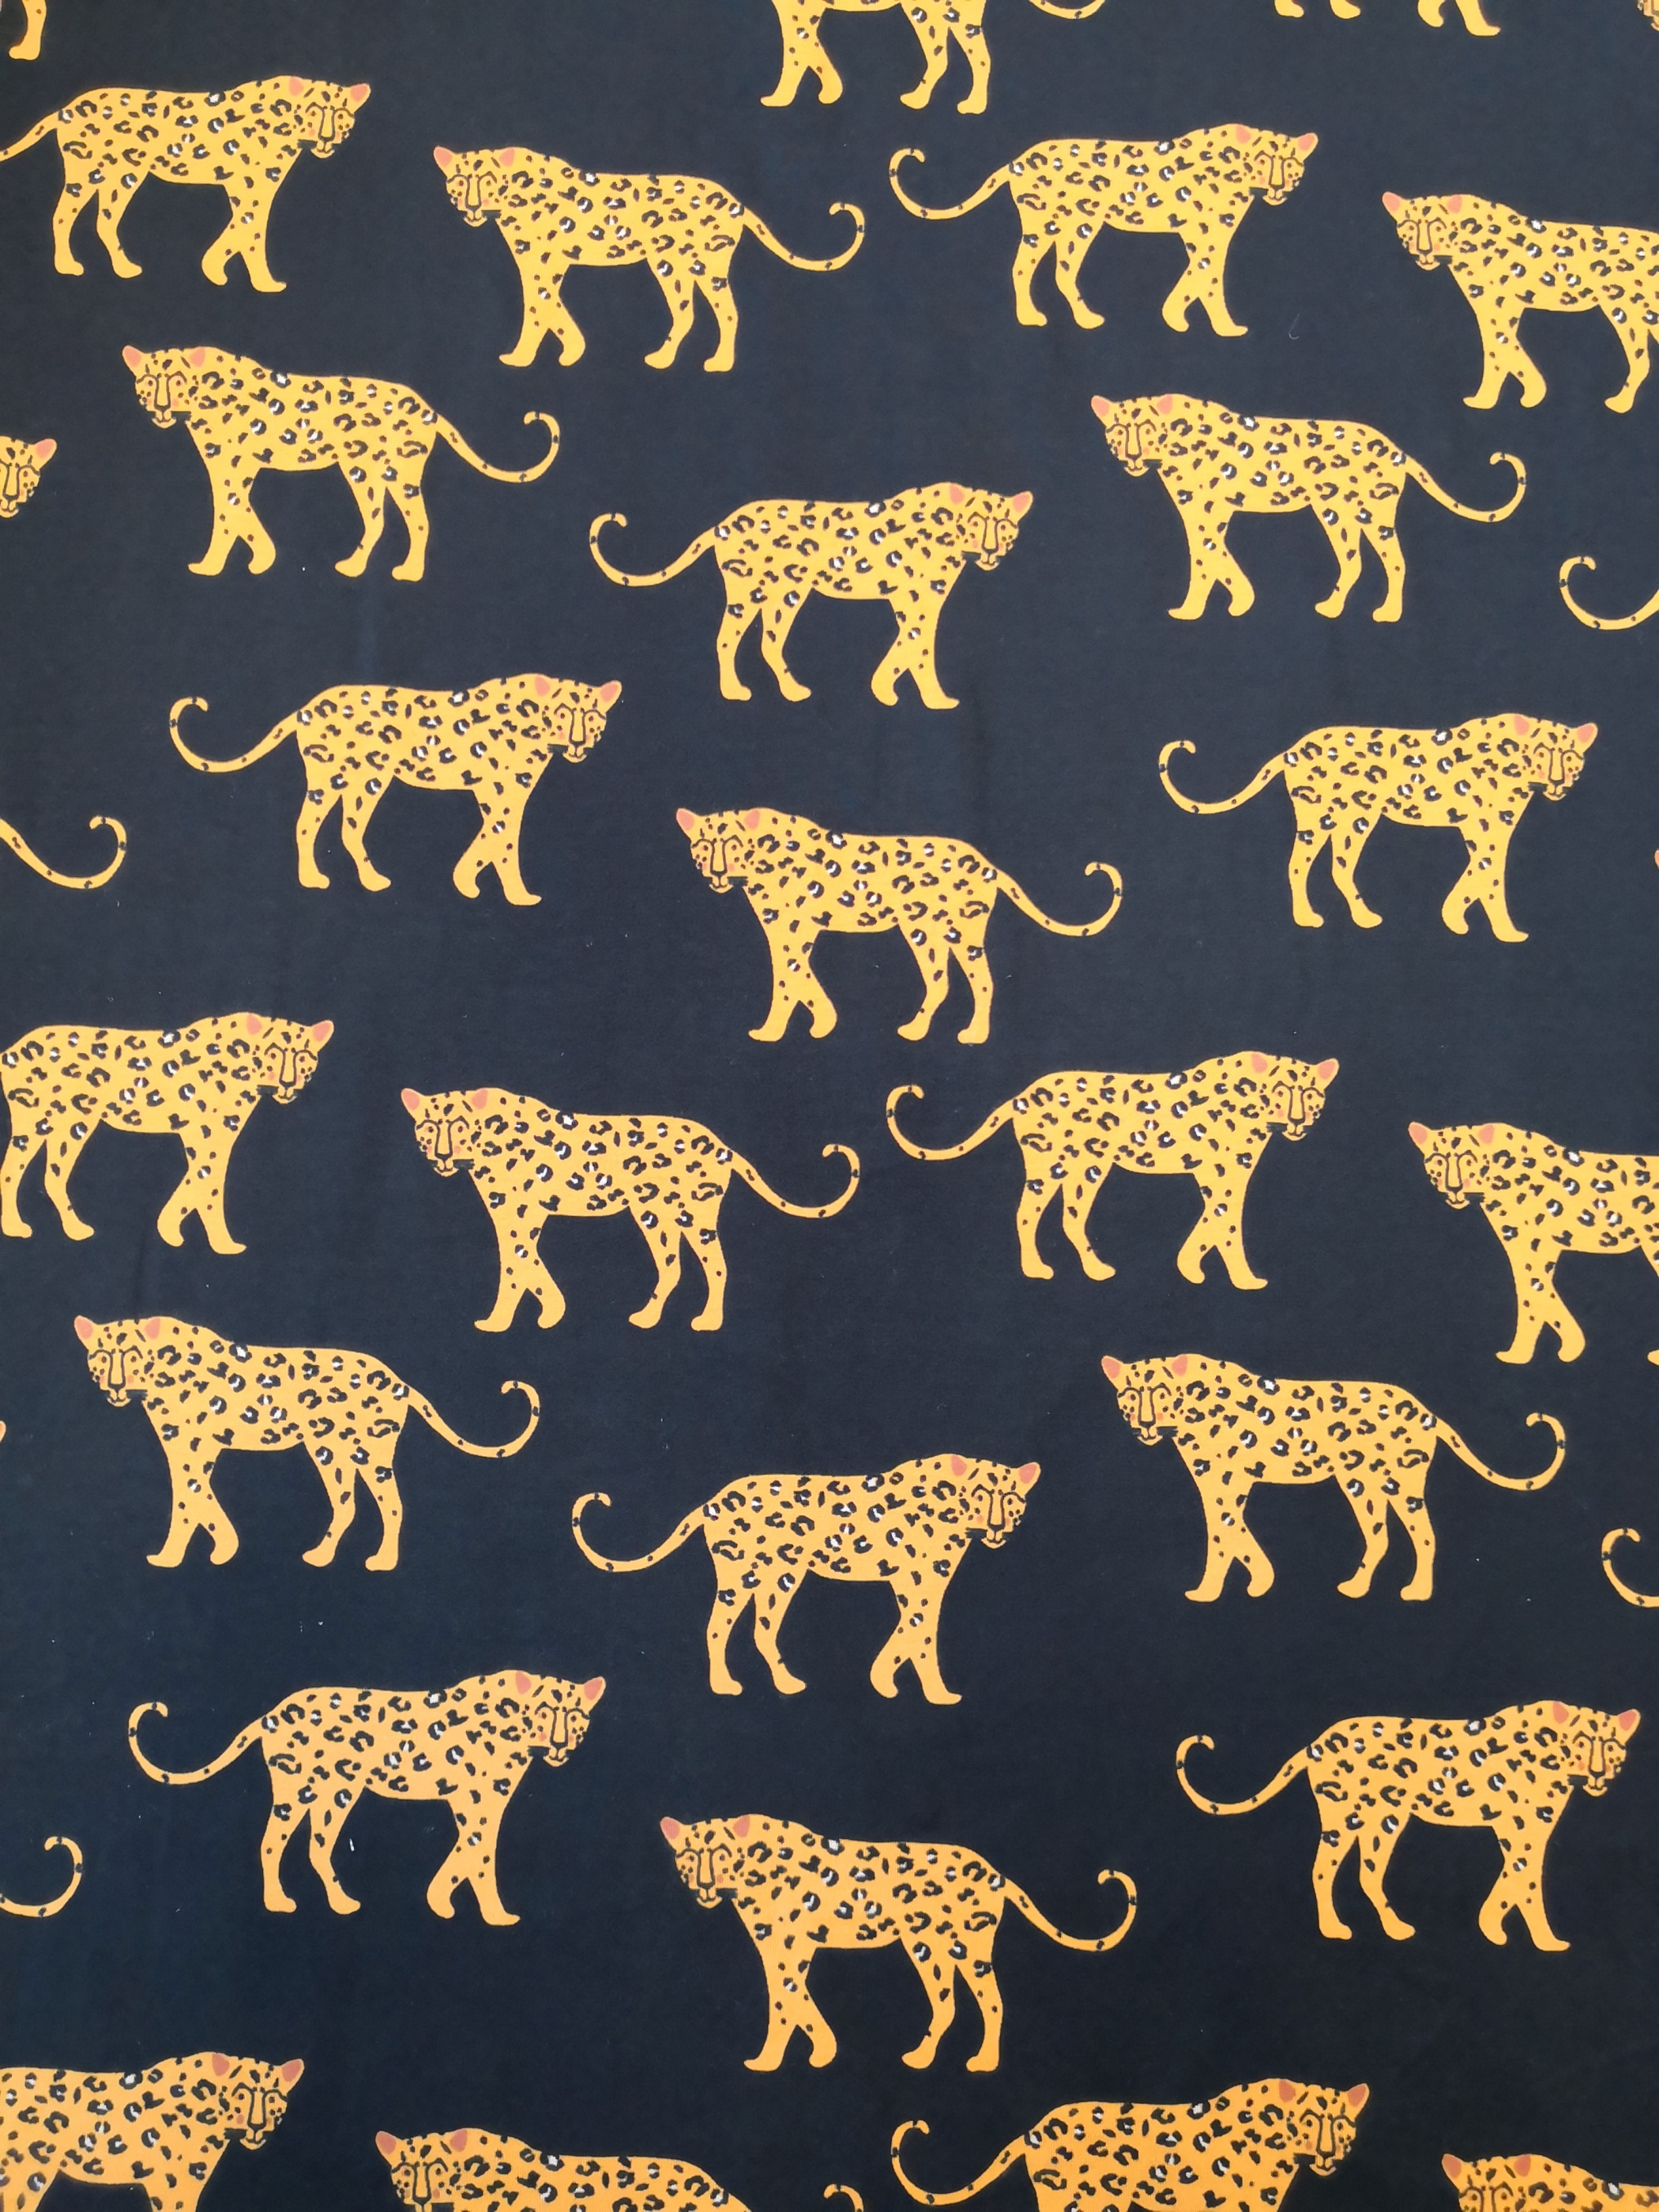 Leopard på svart botten